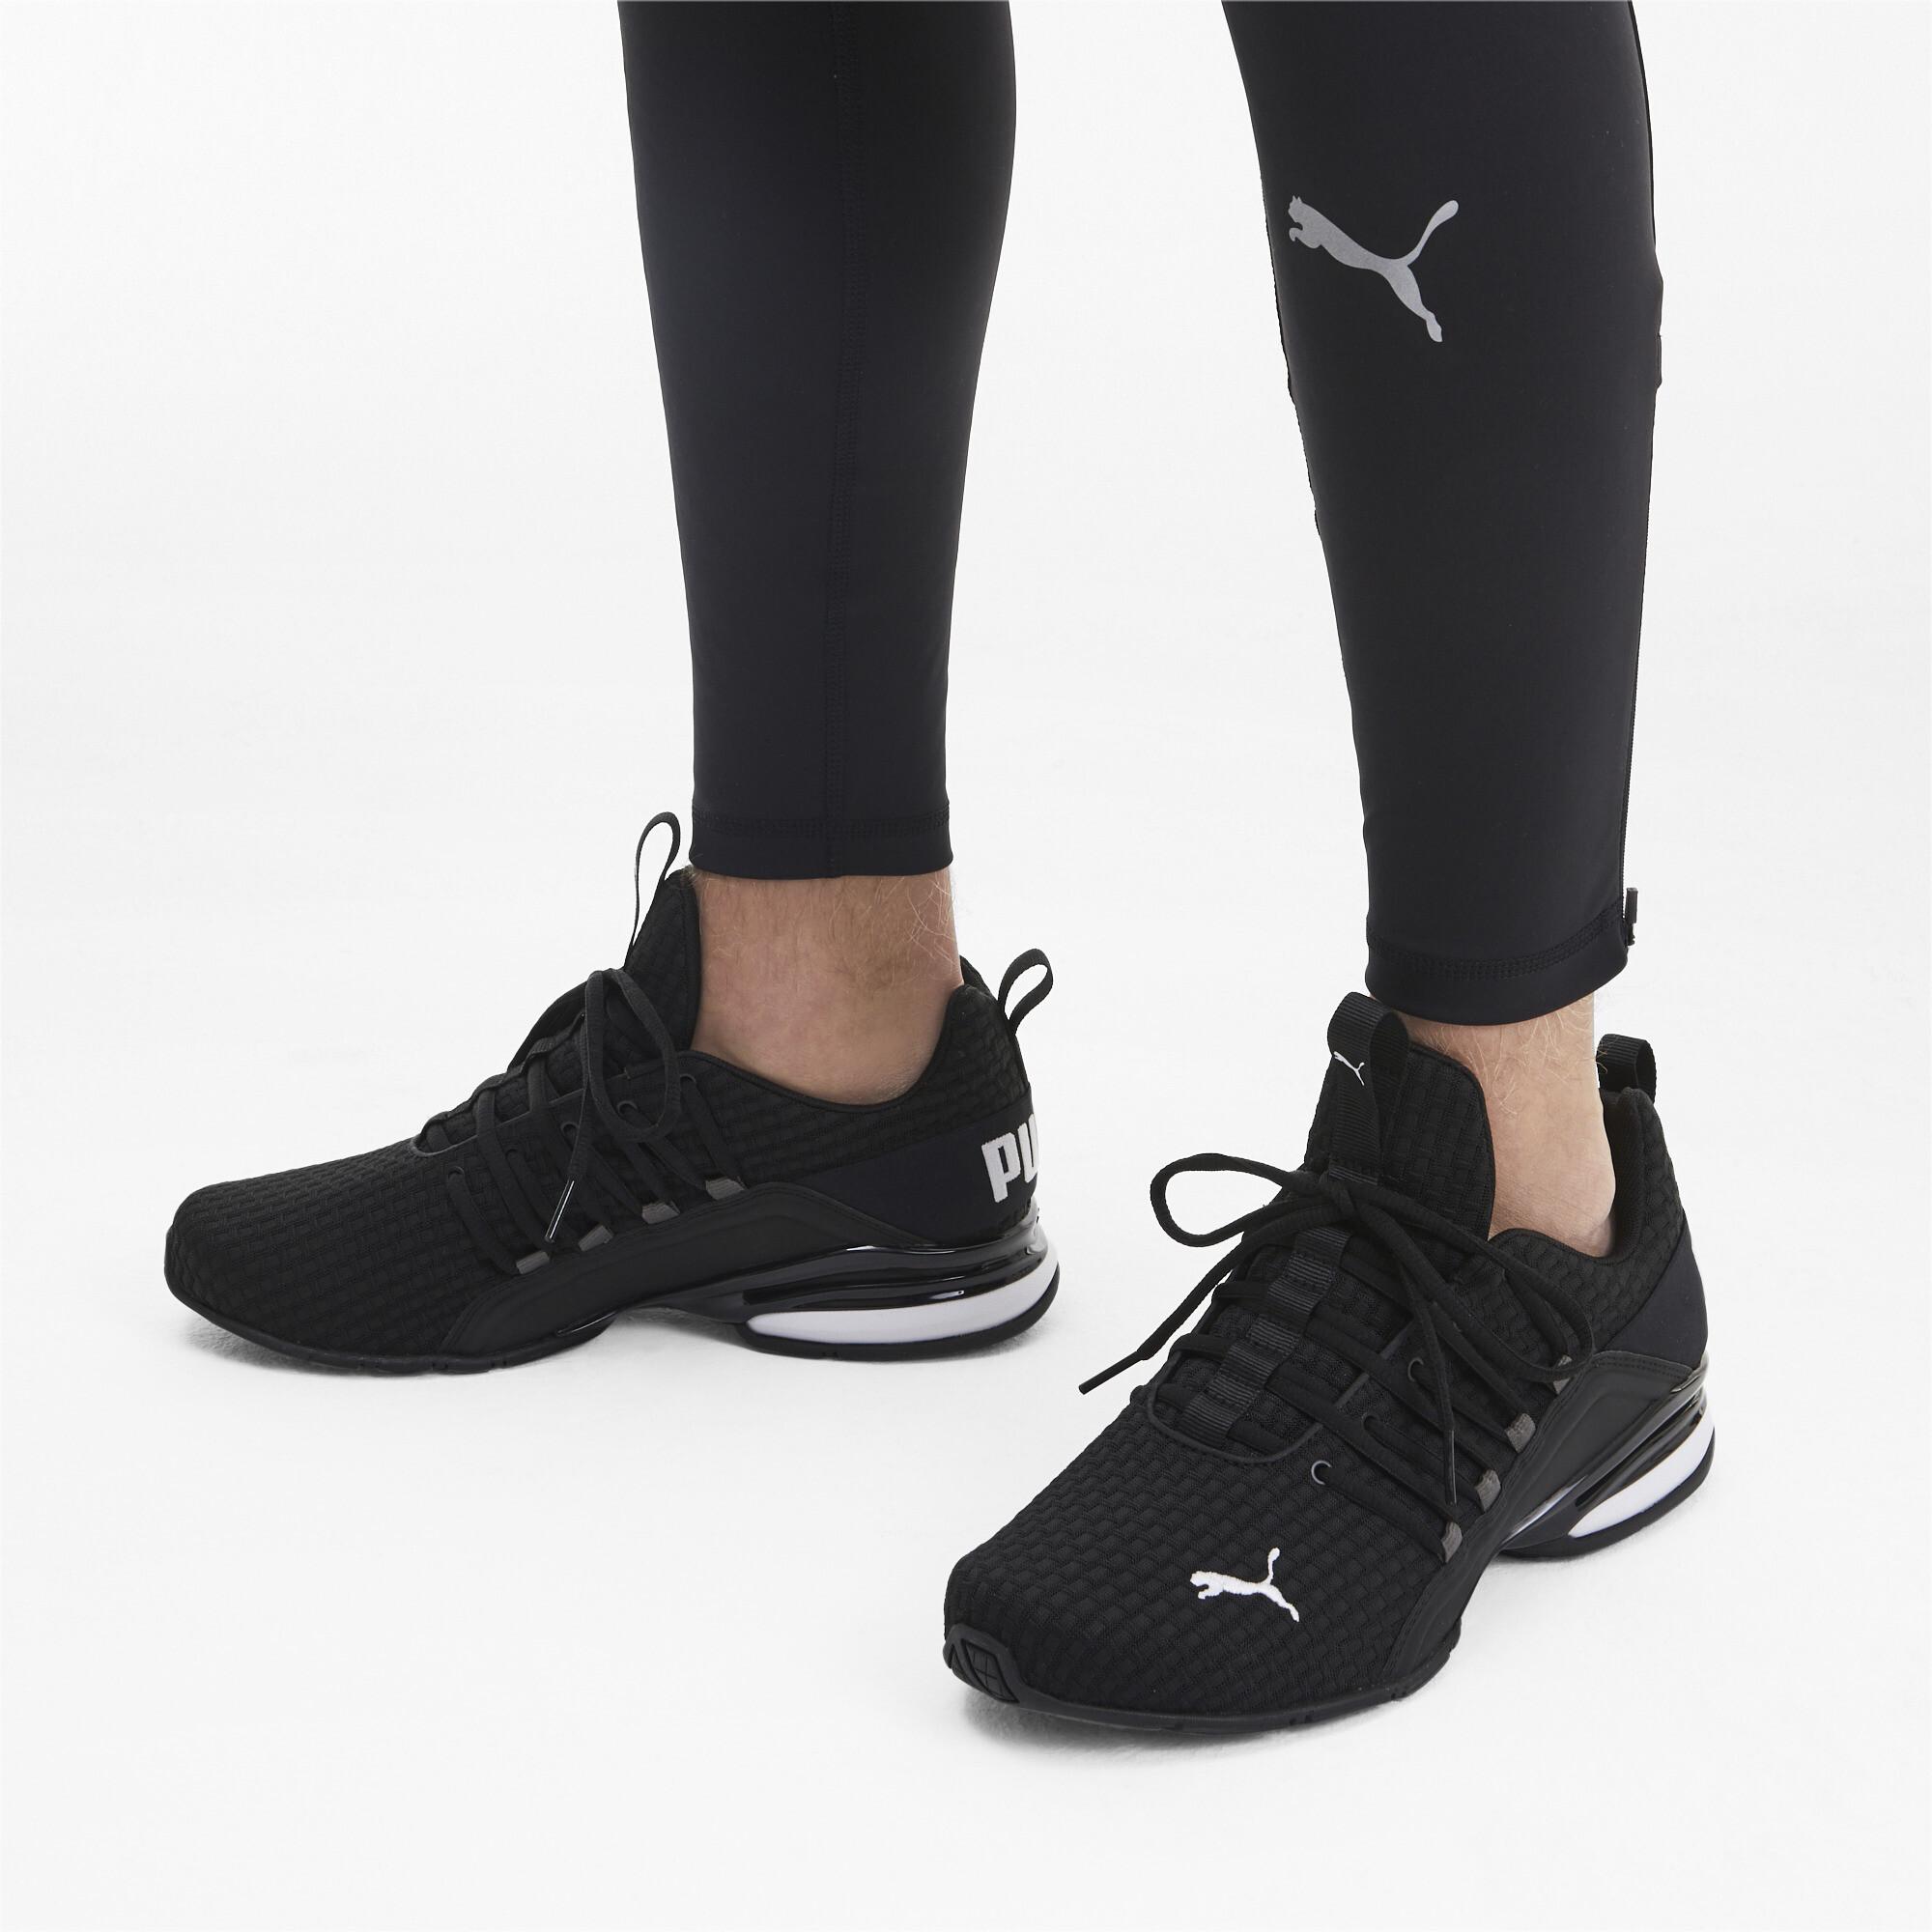 PUMA-Men-039-s-Axelion-Block-Running-Shoes thumbnail 19